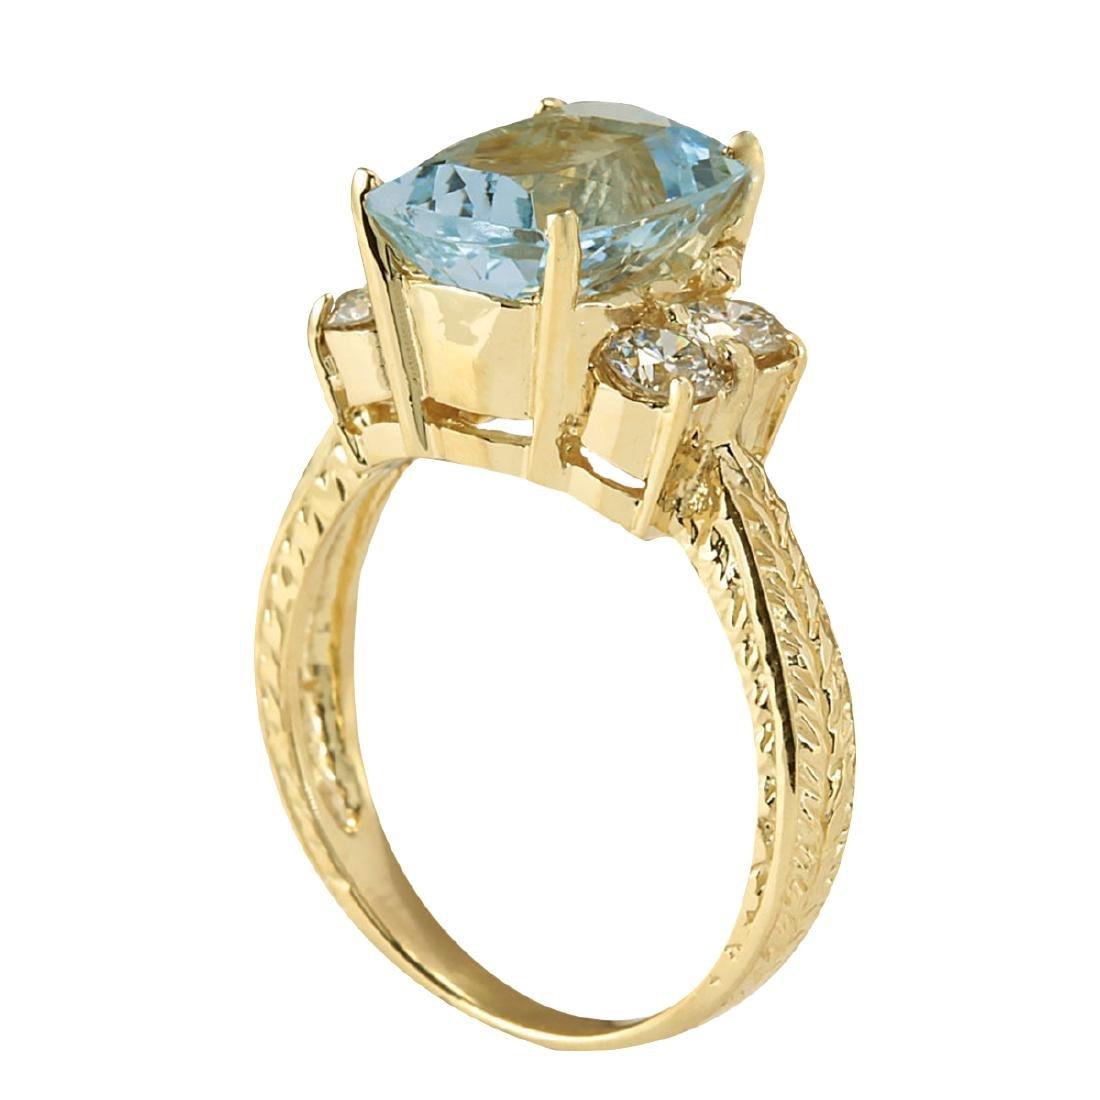 3.67CTW Natural Aquamarine And Diamond Ring In 18K - 3